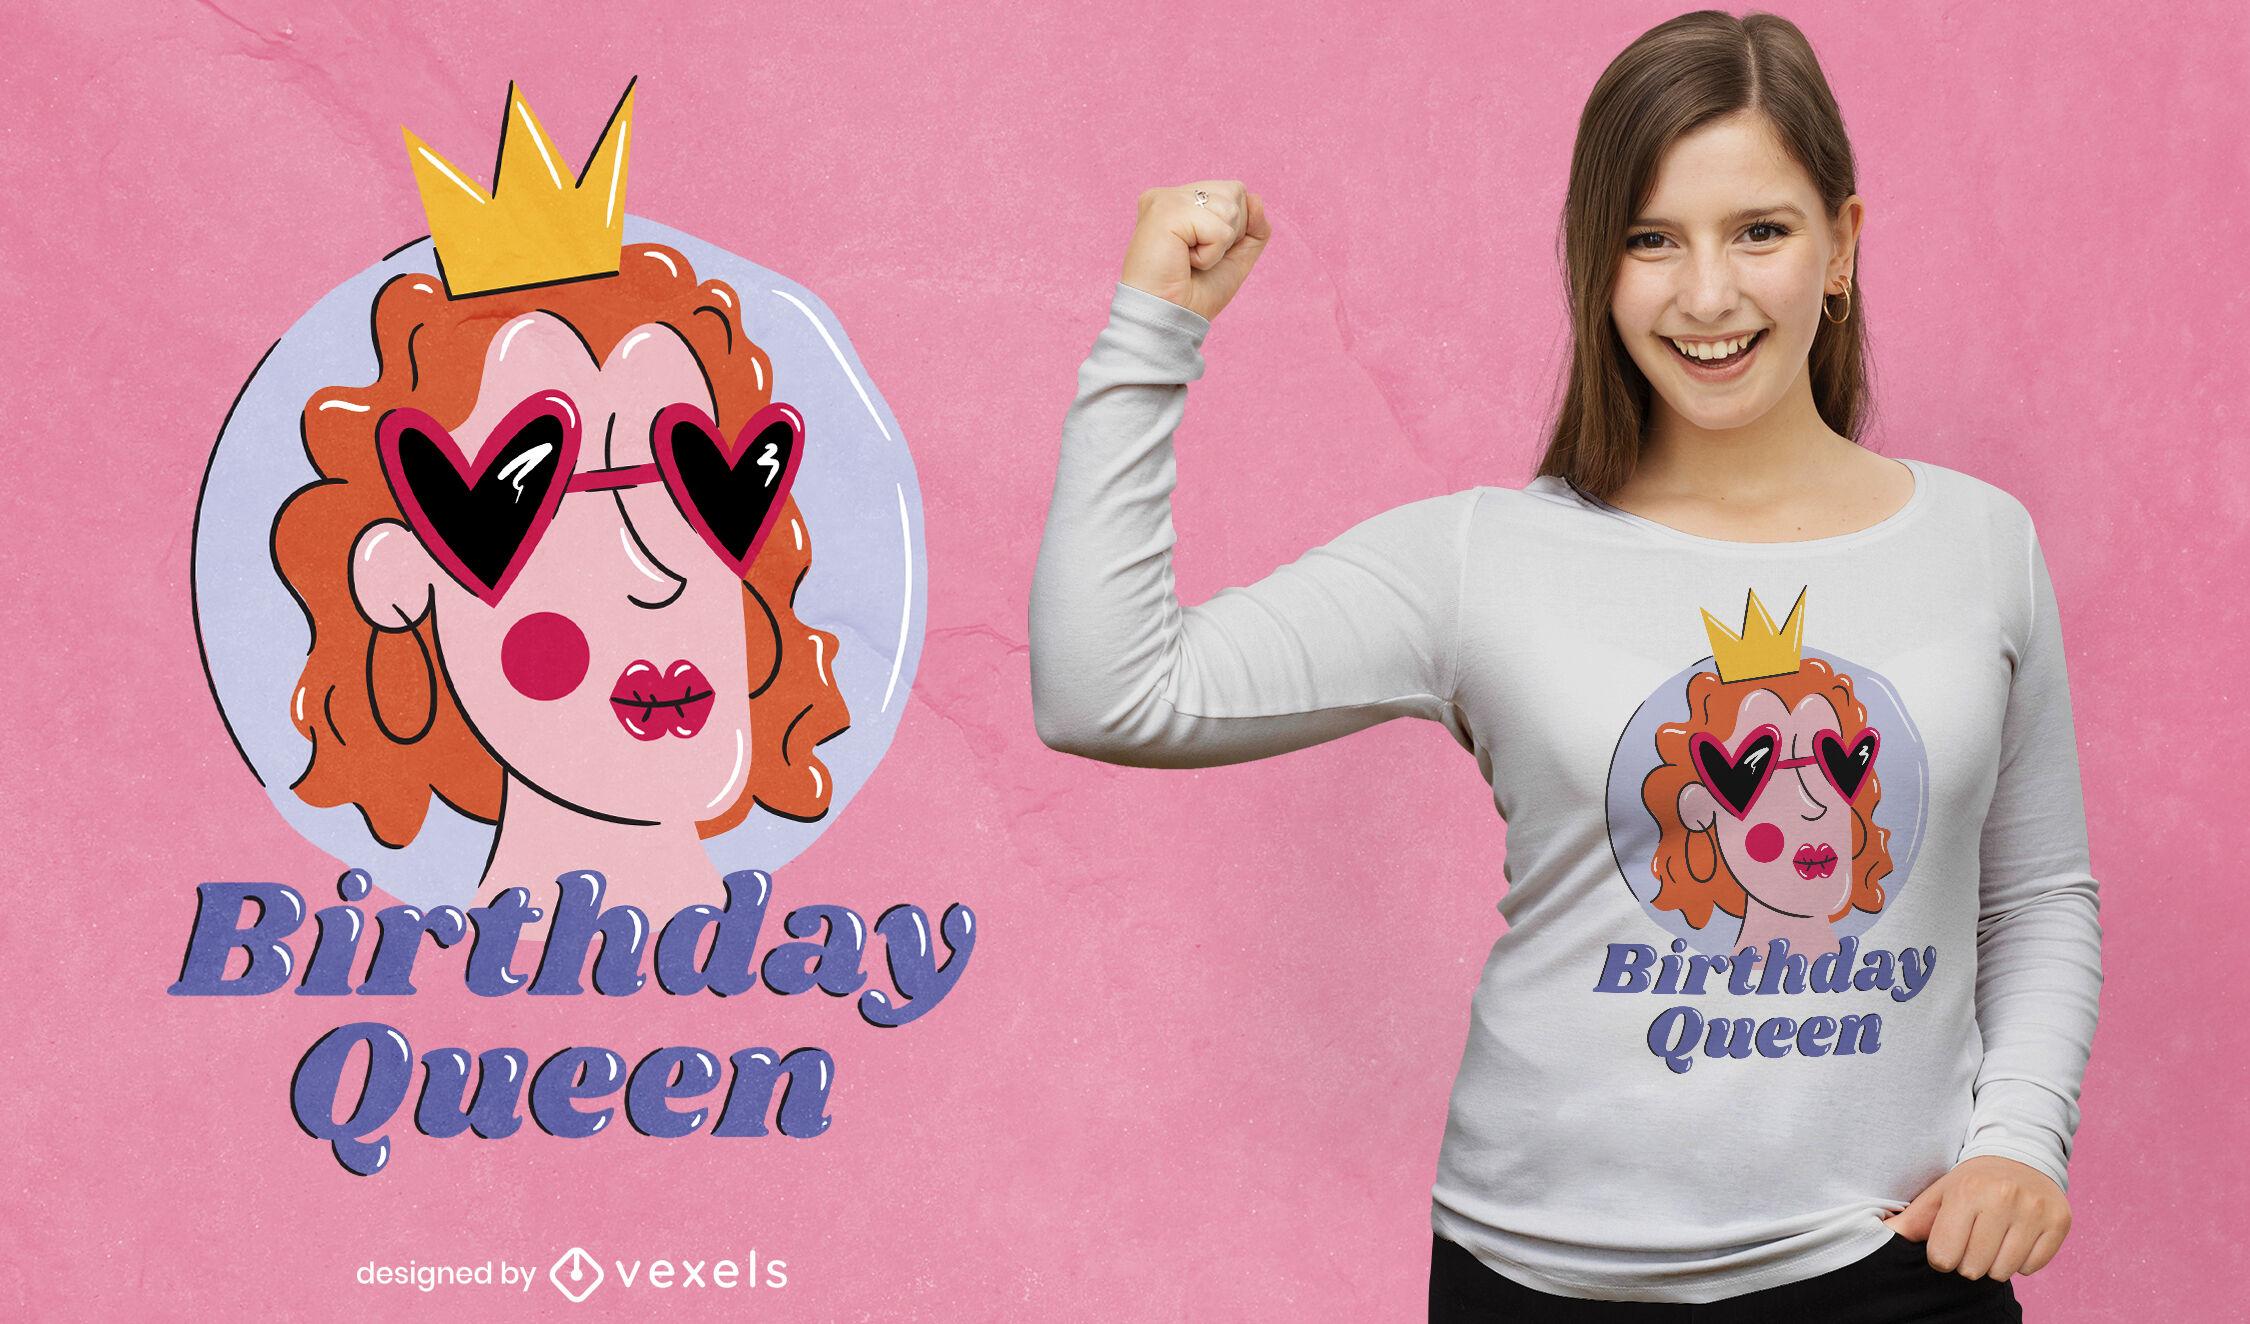 Cartoon birthday woman with crown t-shirt design